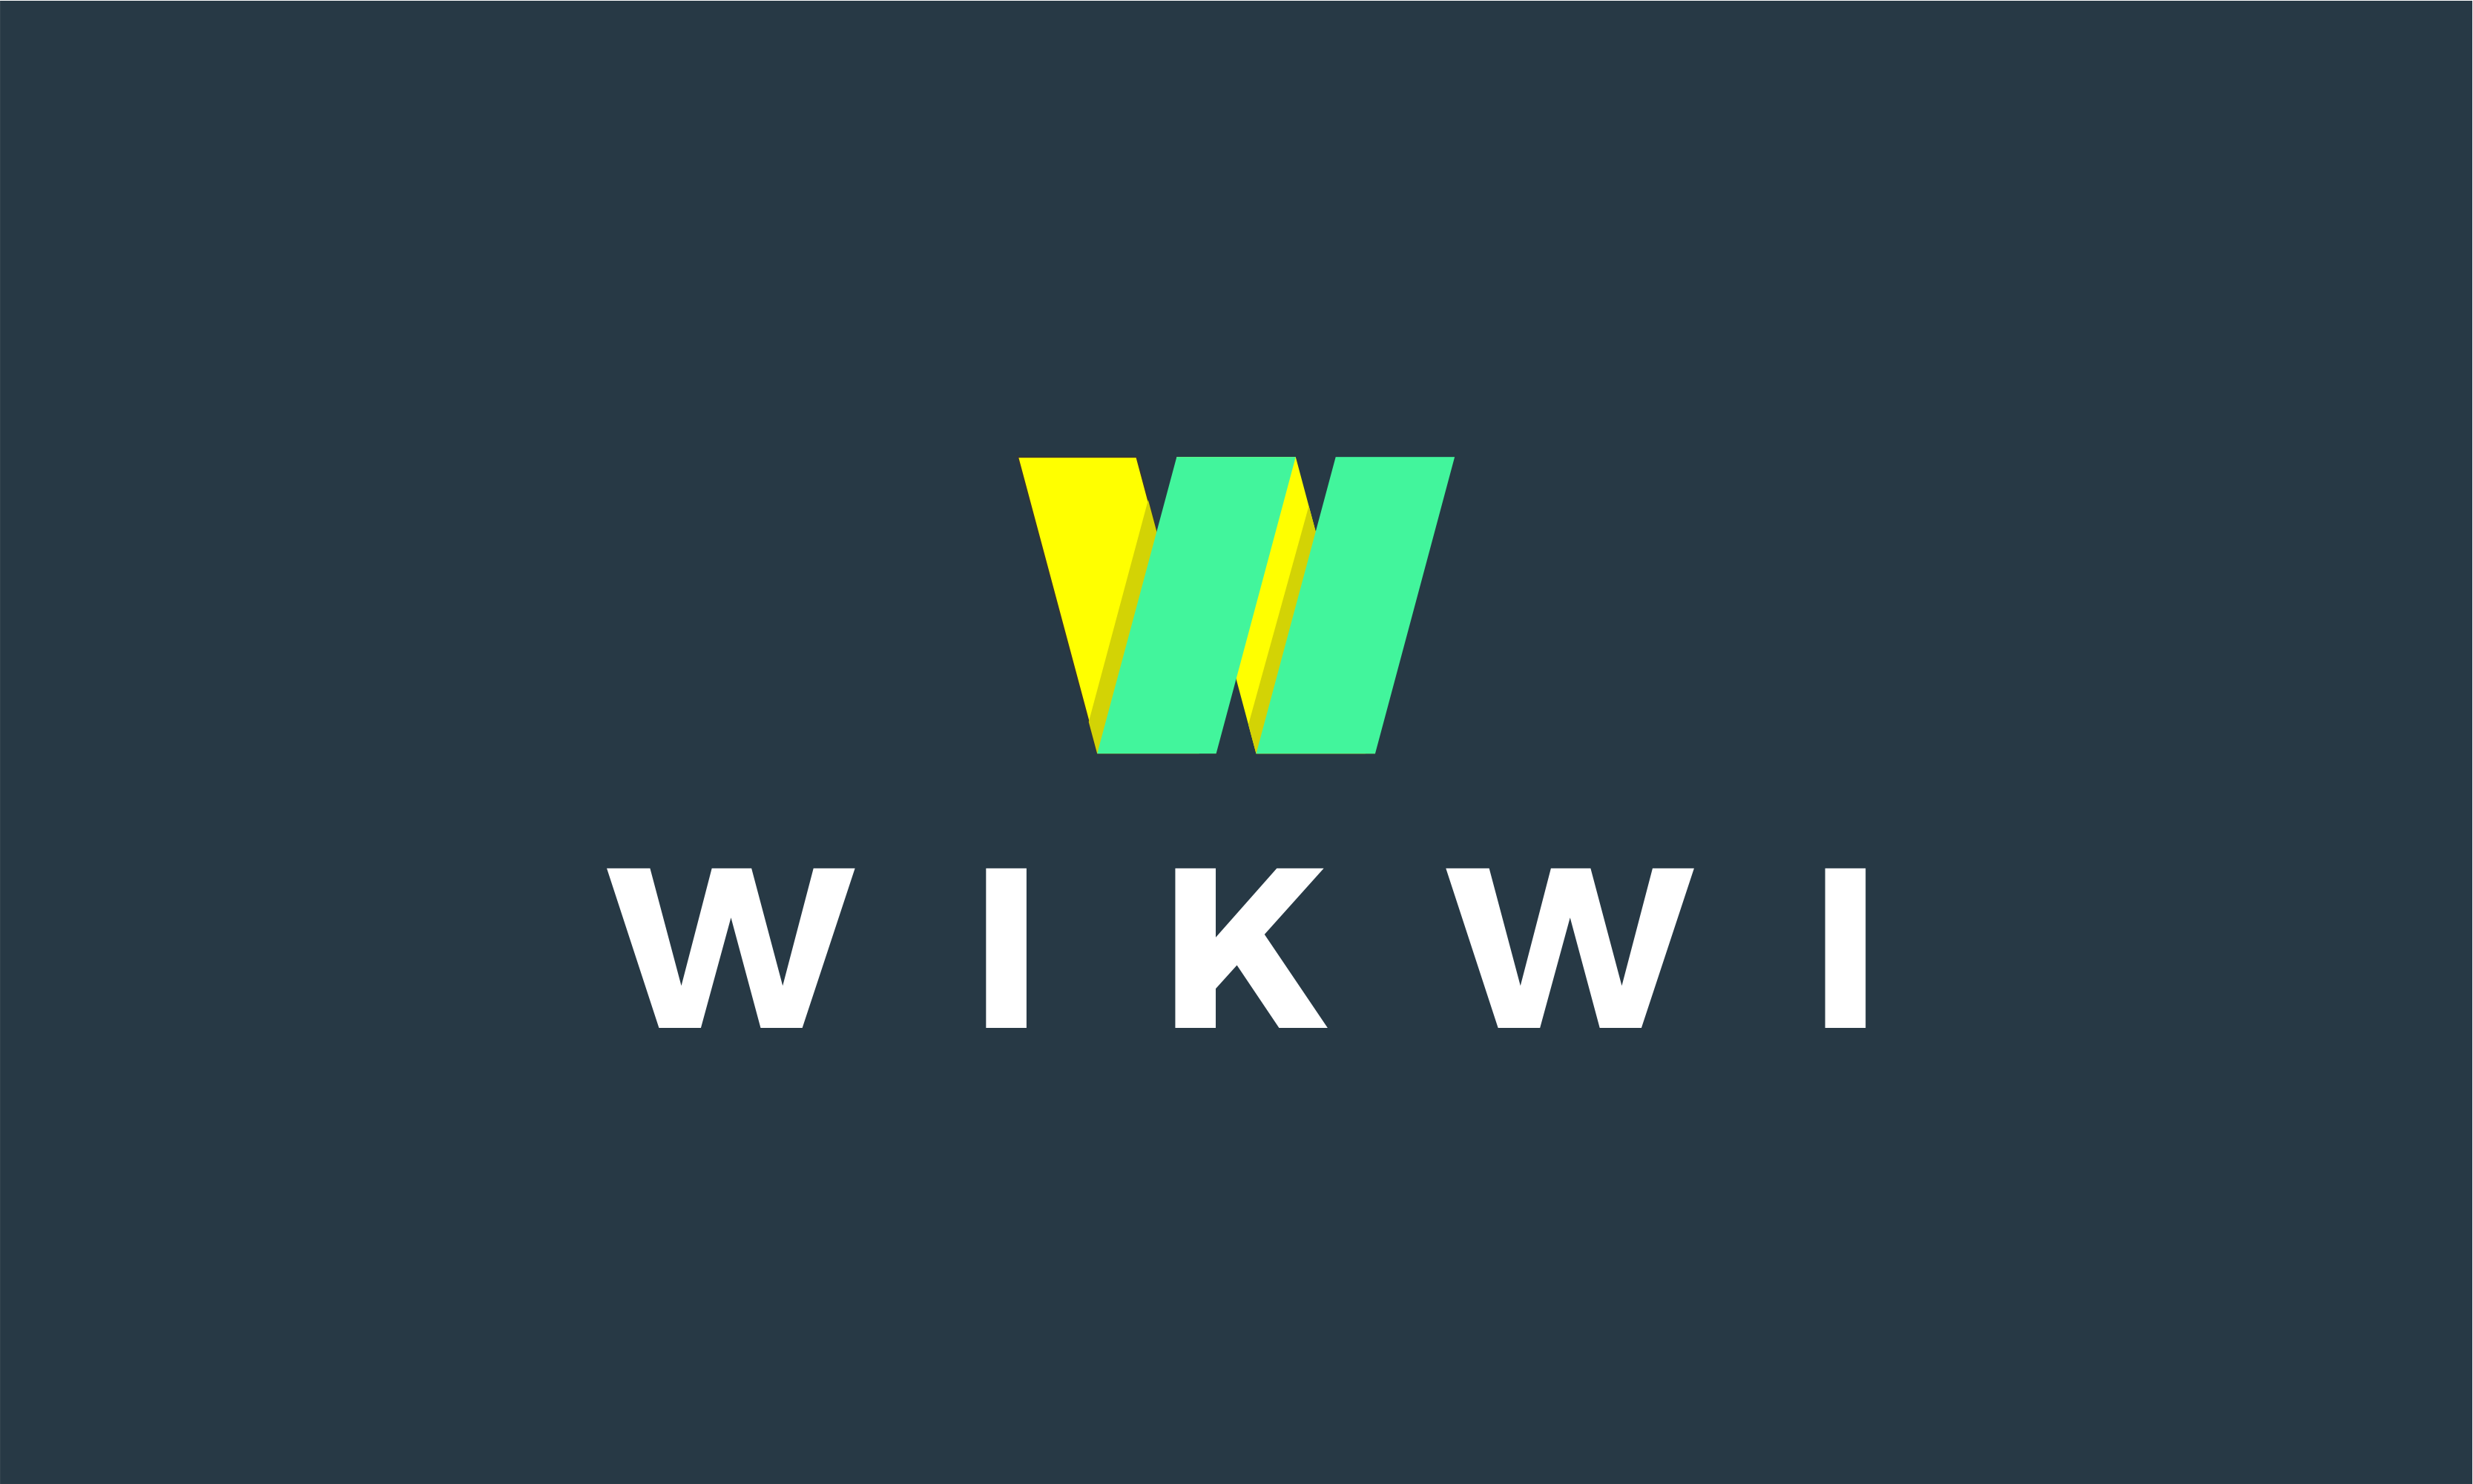 wikwi